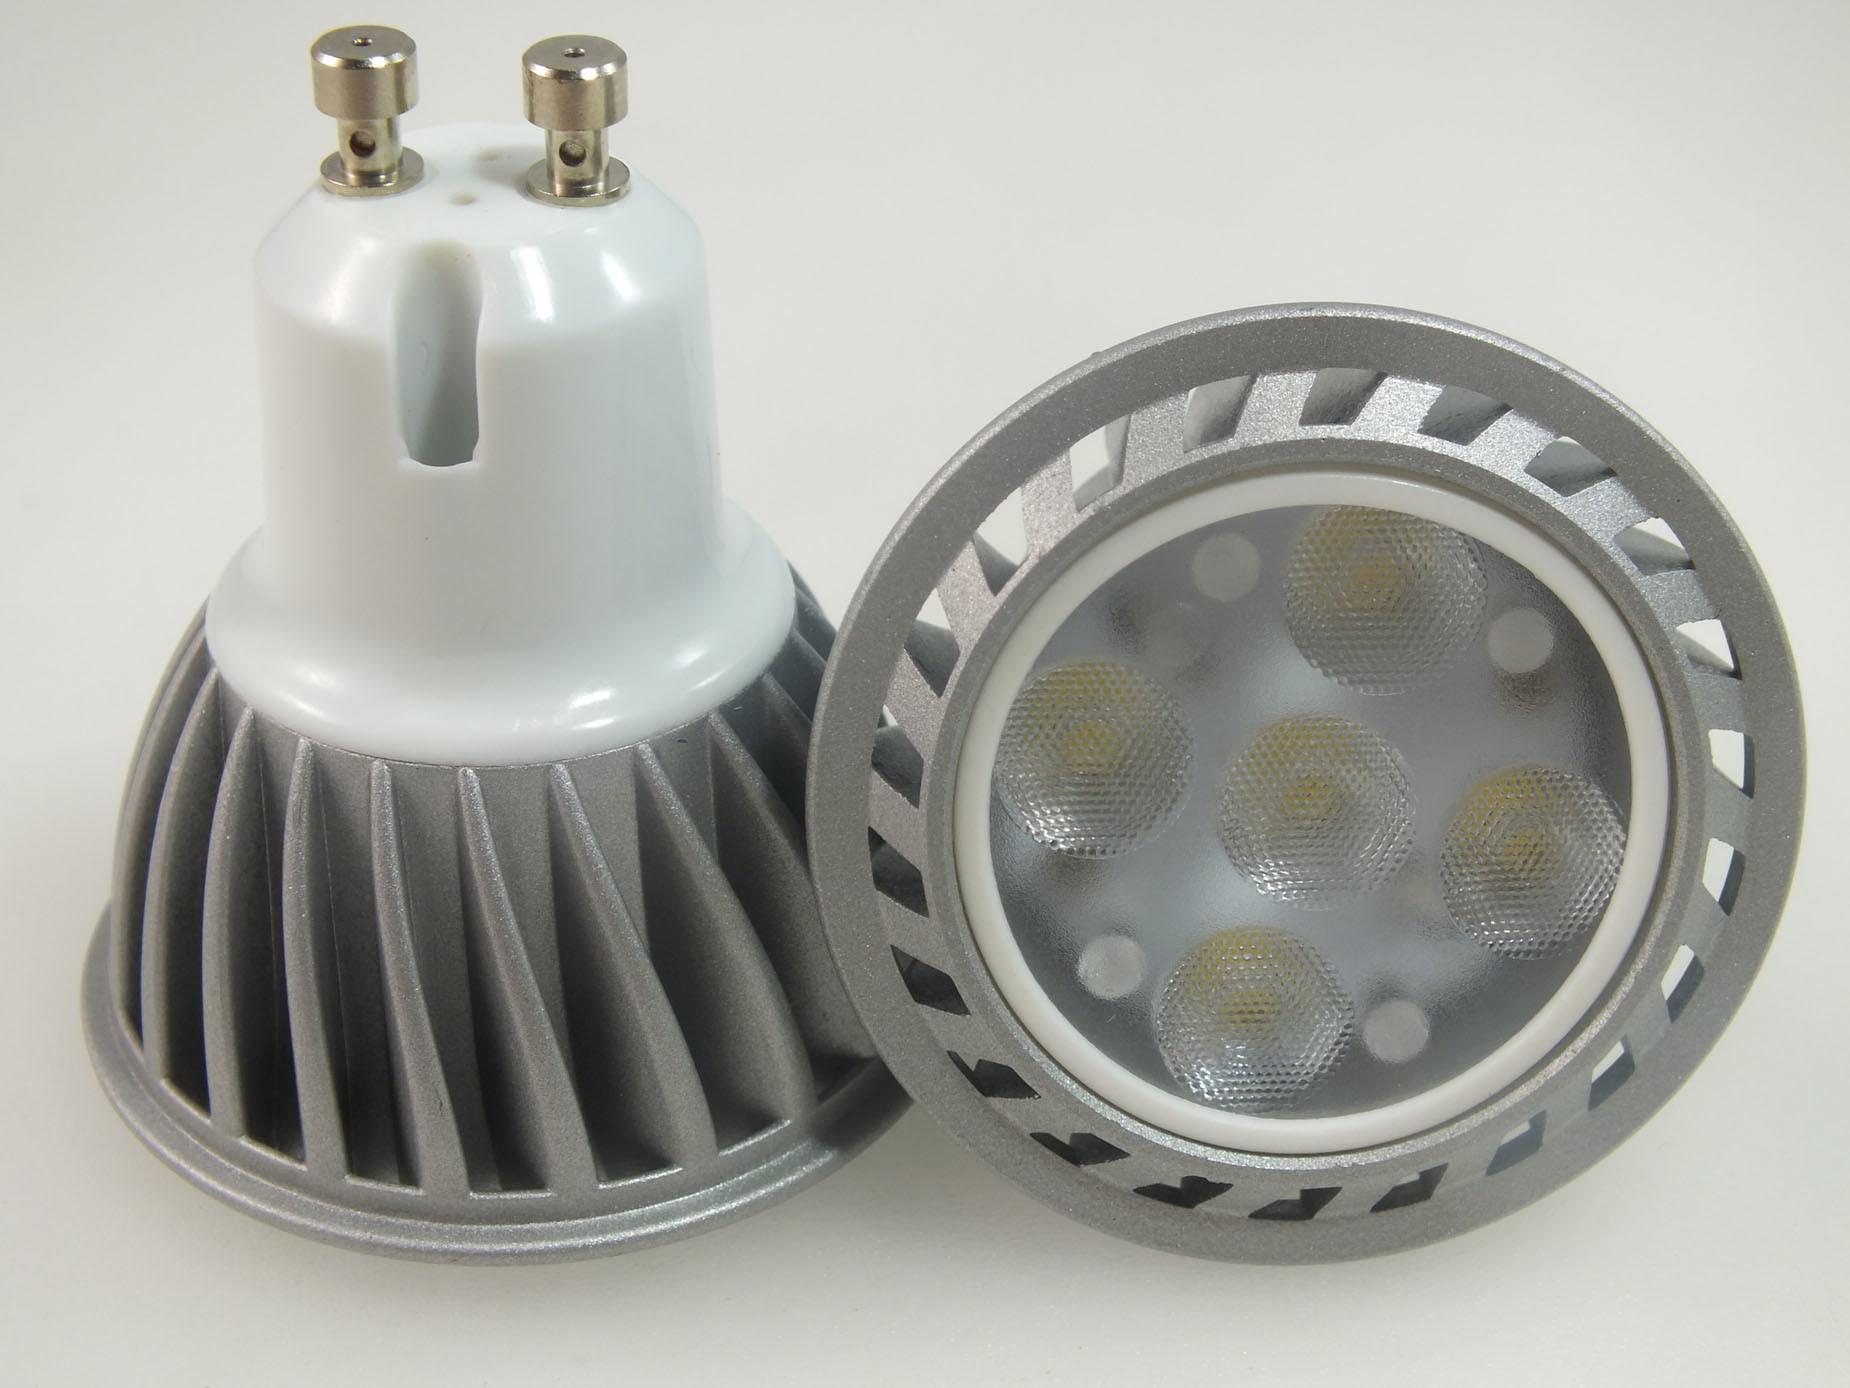 New High Power LED GU10 5W Bulb (GU10AA1-5S3030)